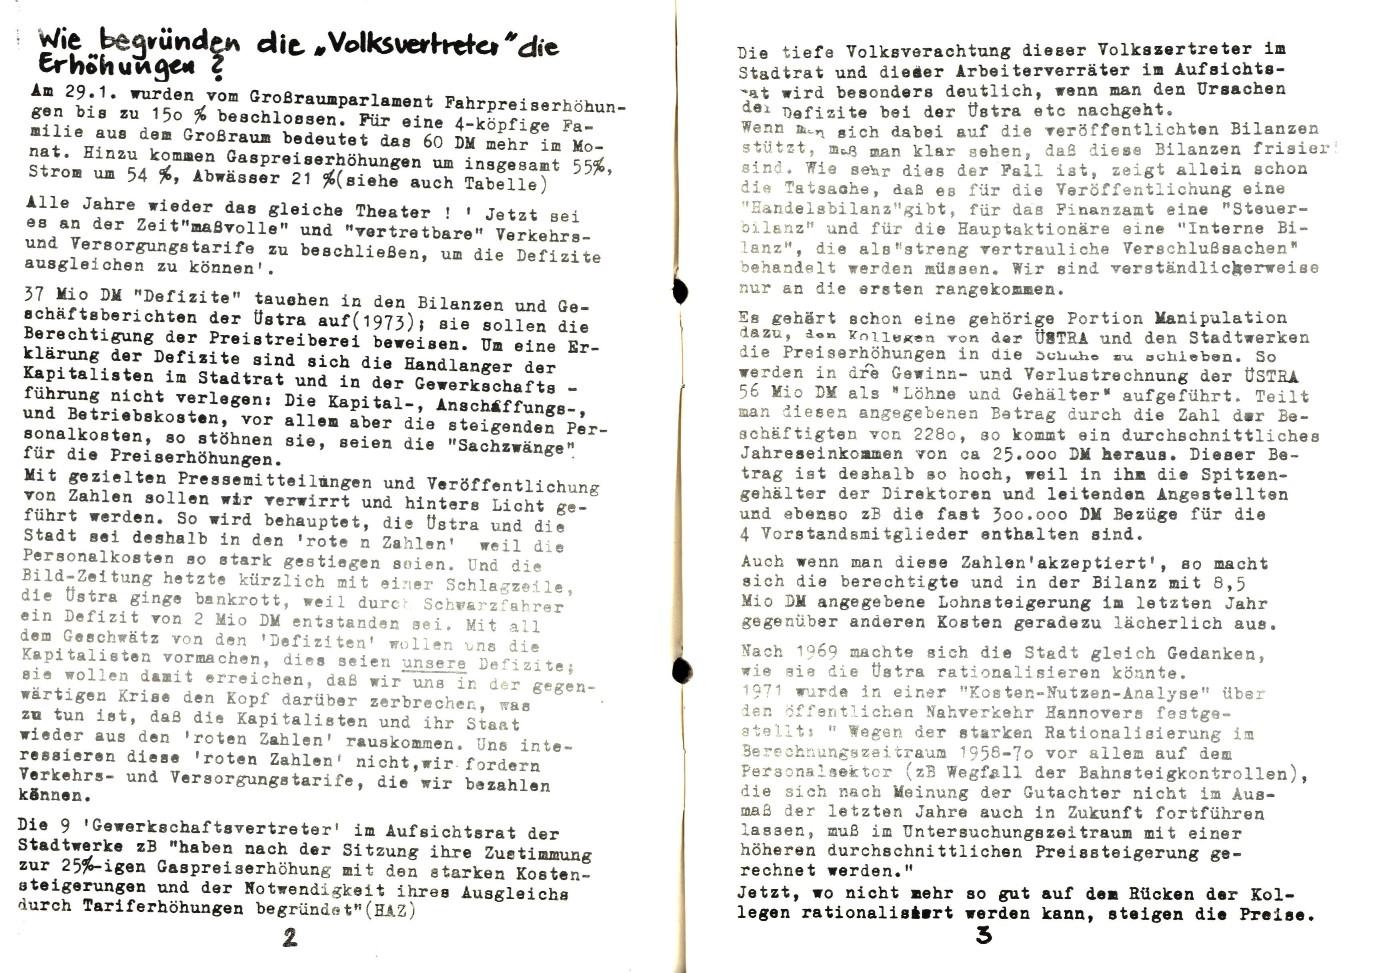 Hannover_AO_1975_Fahrpreisboykott_03